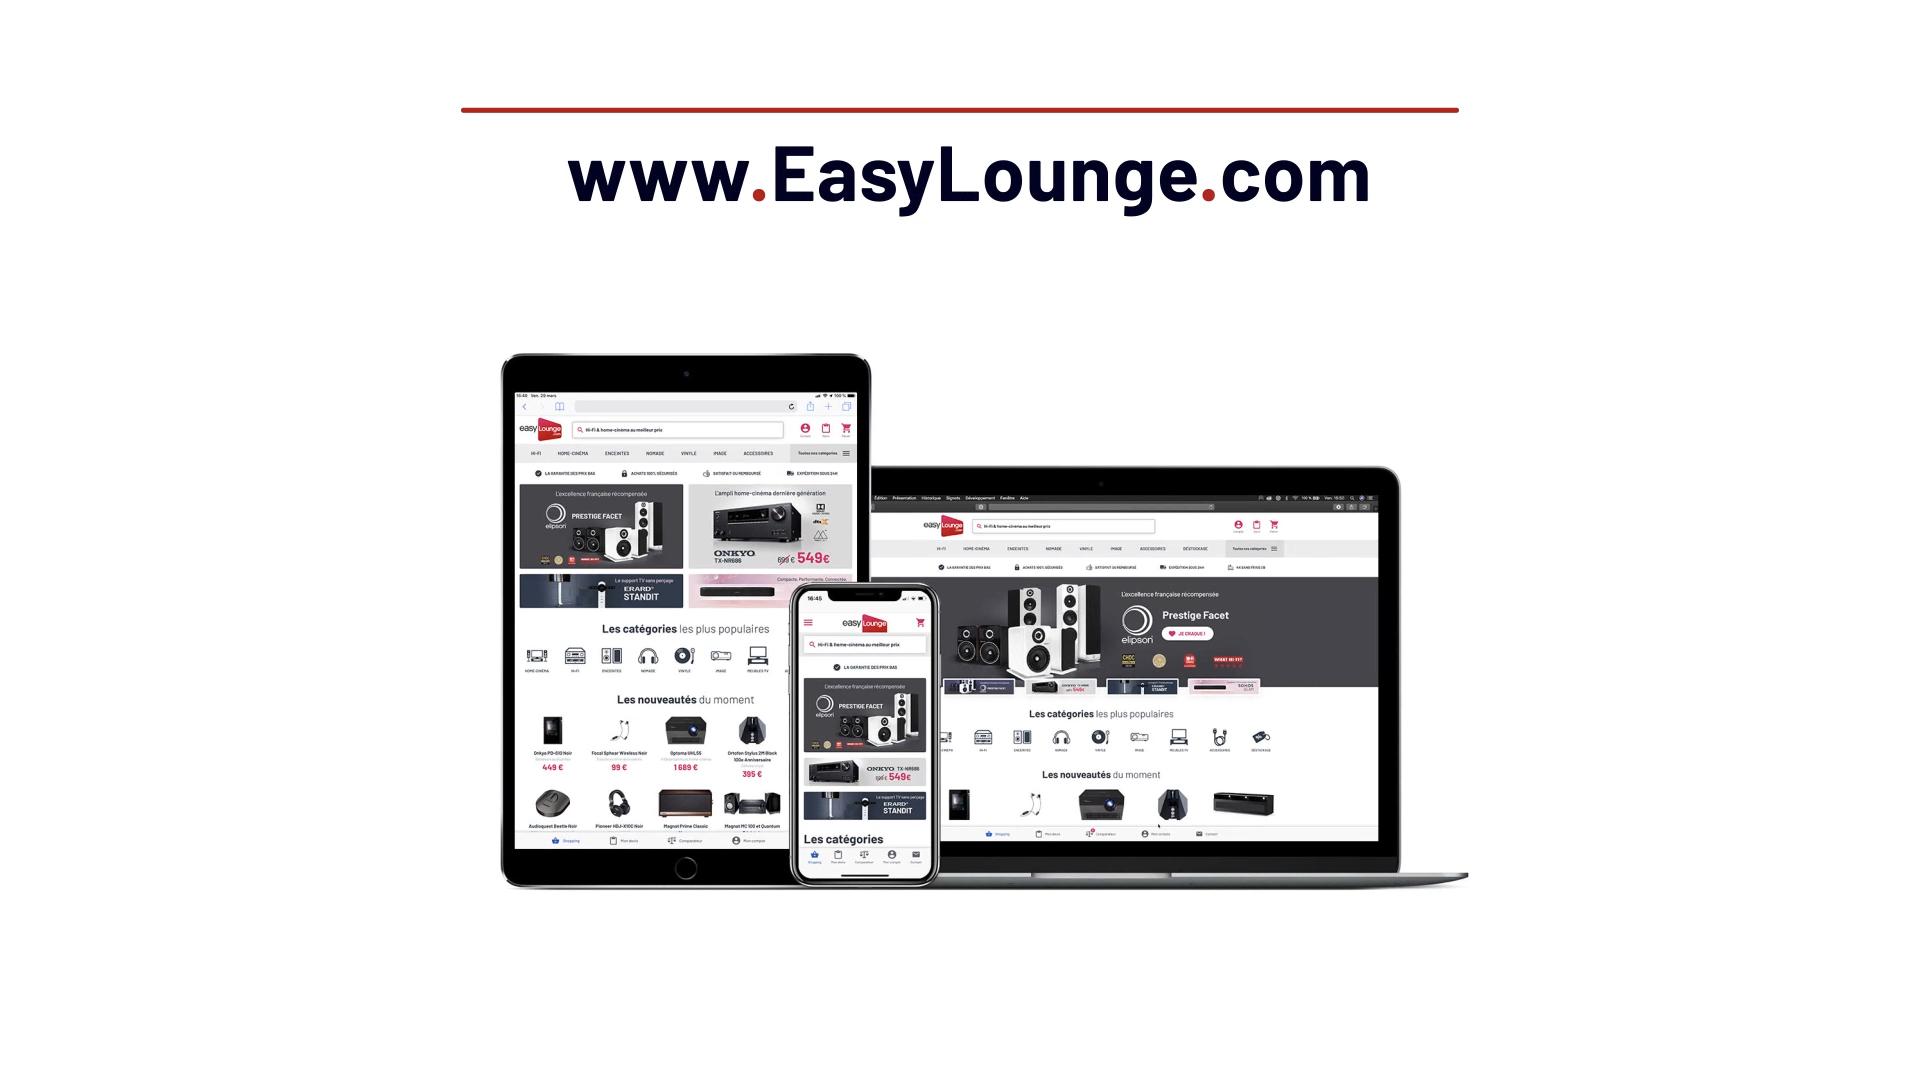 Agence Motion Design & Vidéo Marketing Nice - Zanimal Prod - Easy Lougne 15 ans